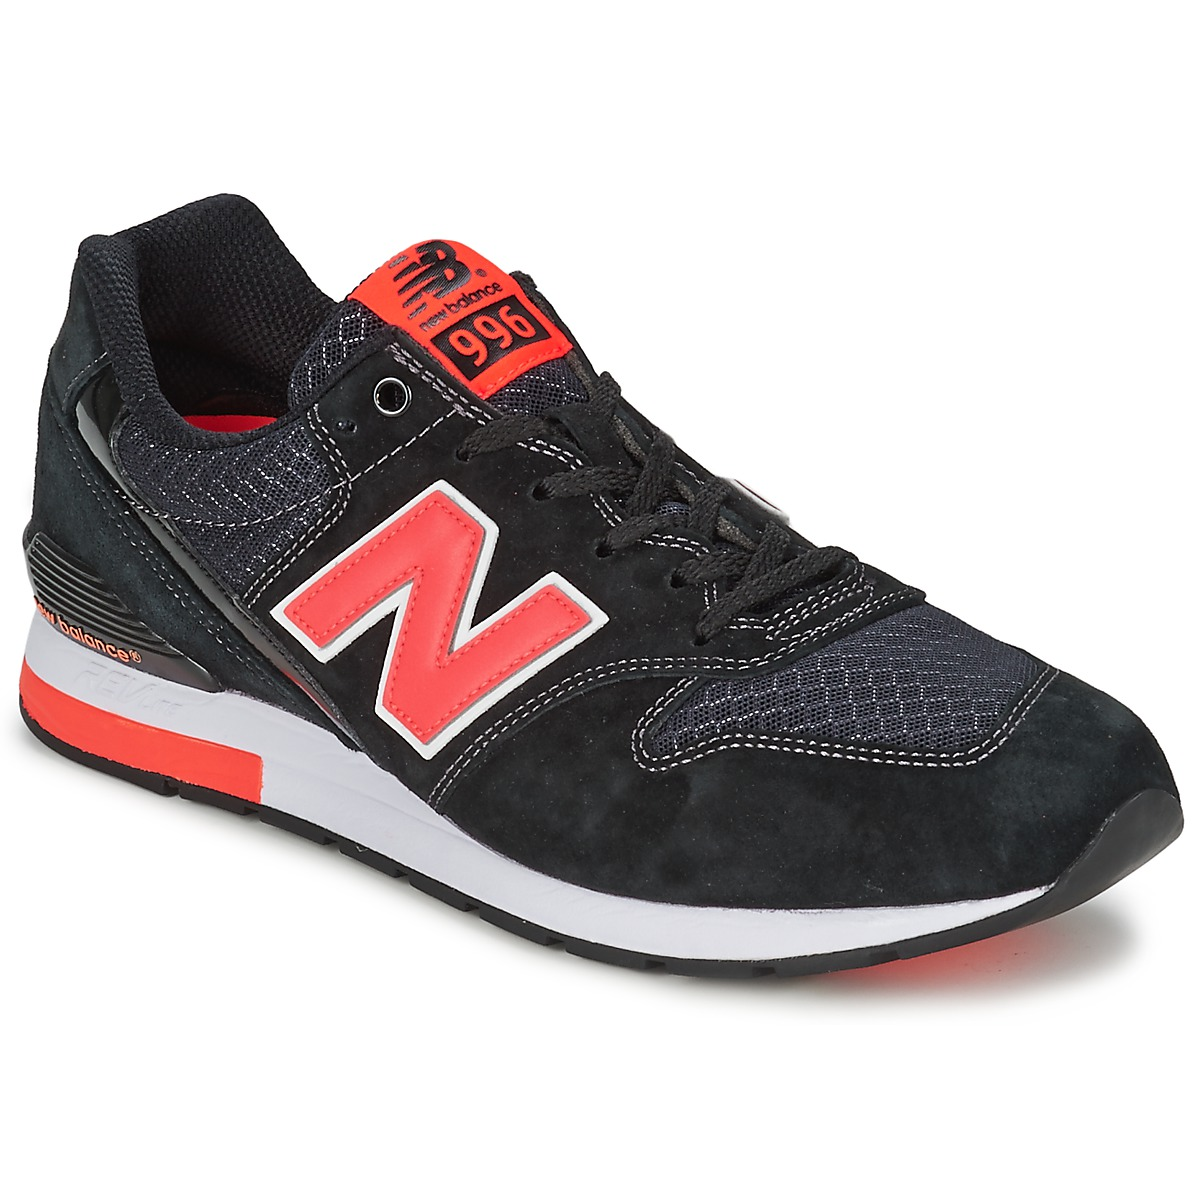 New Balance MRL996 Schwarz / Rot